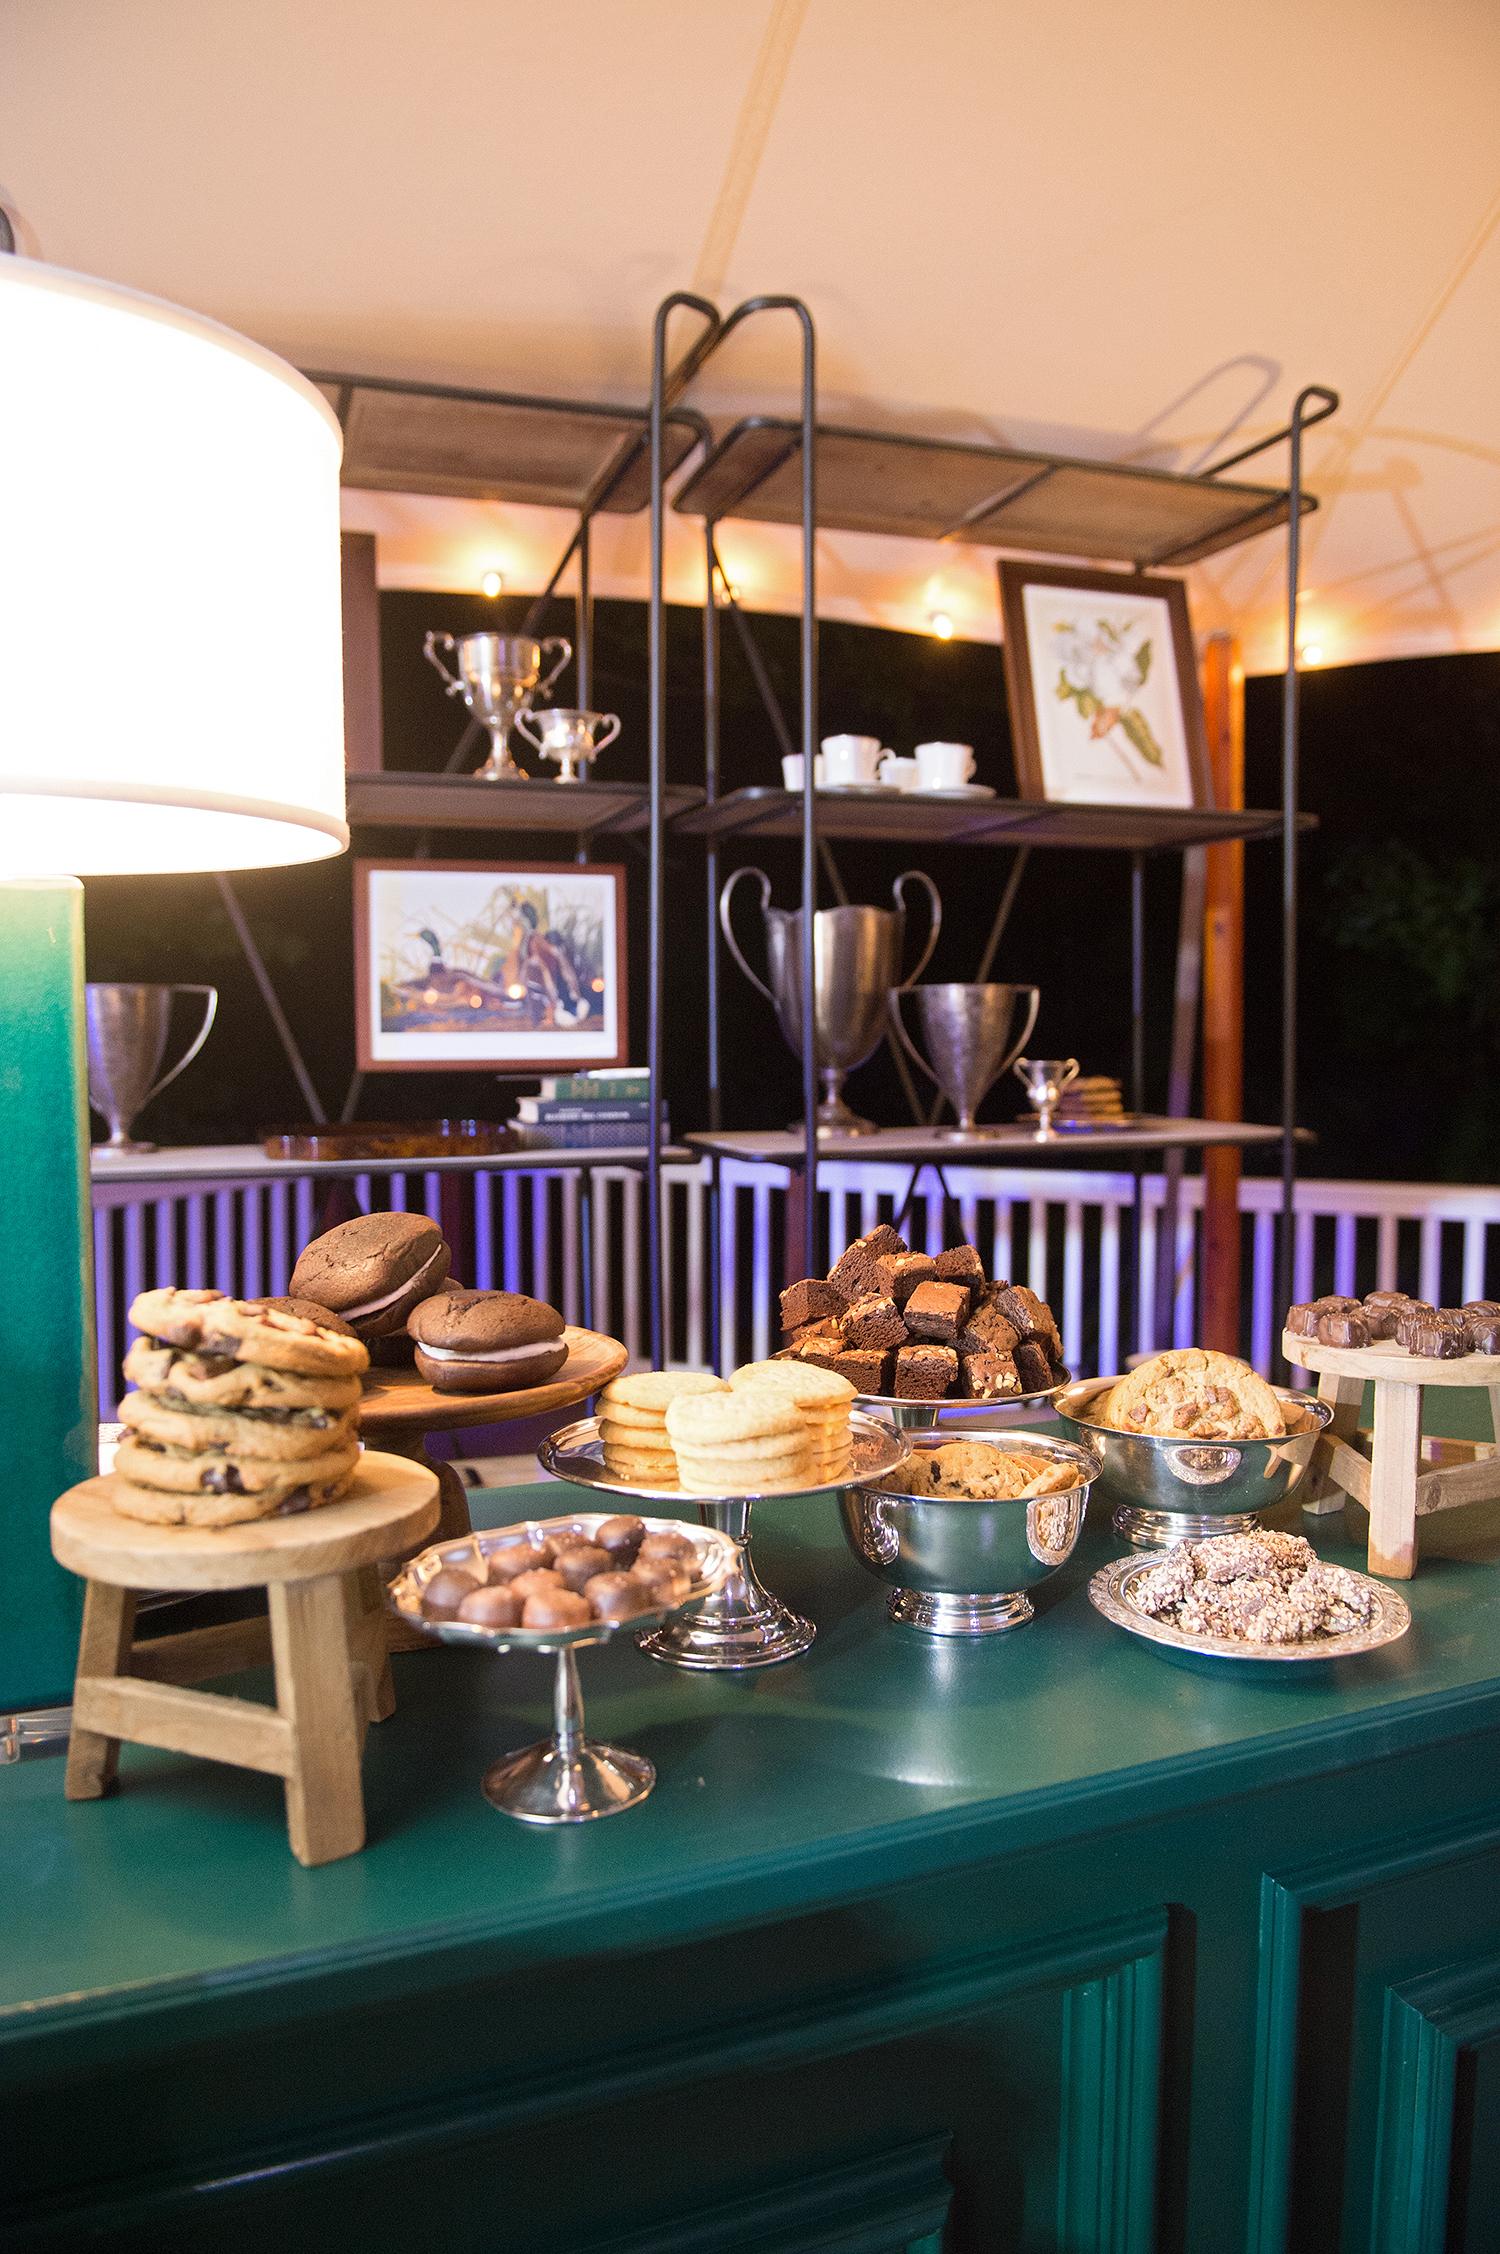 charles andrew wedding desserts at bar